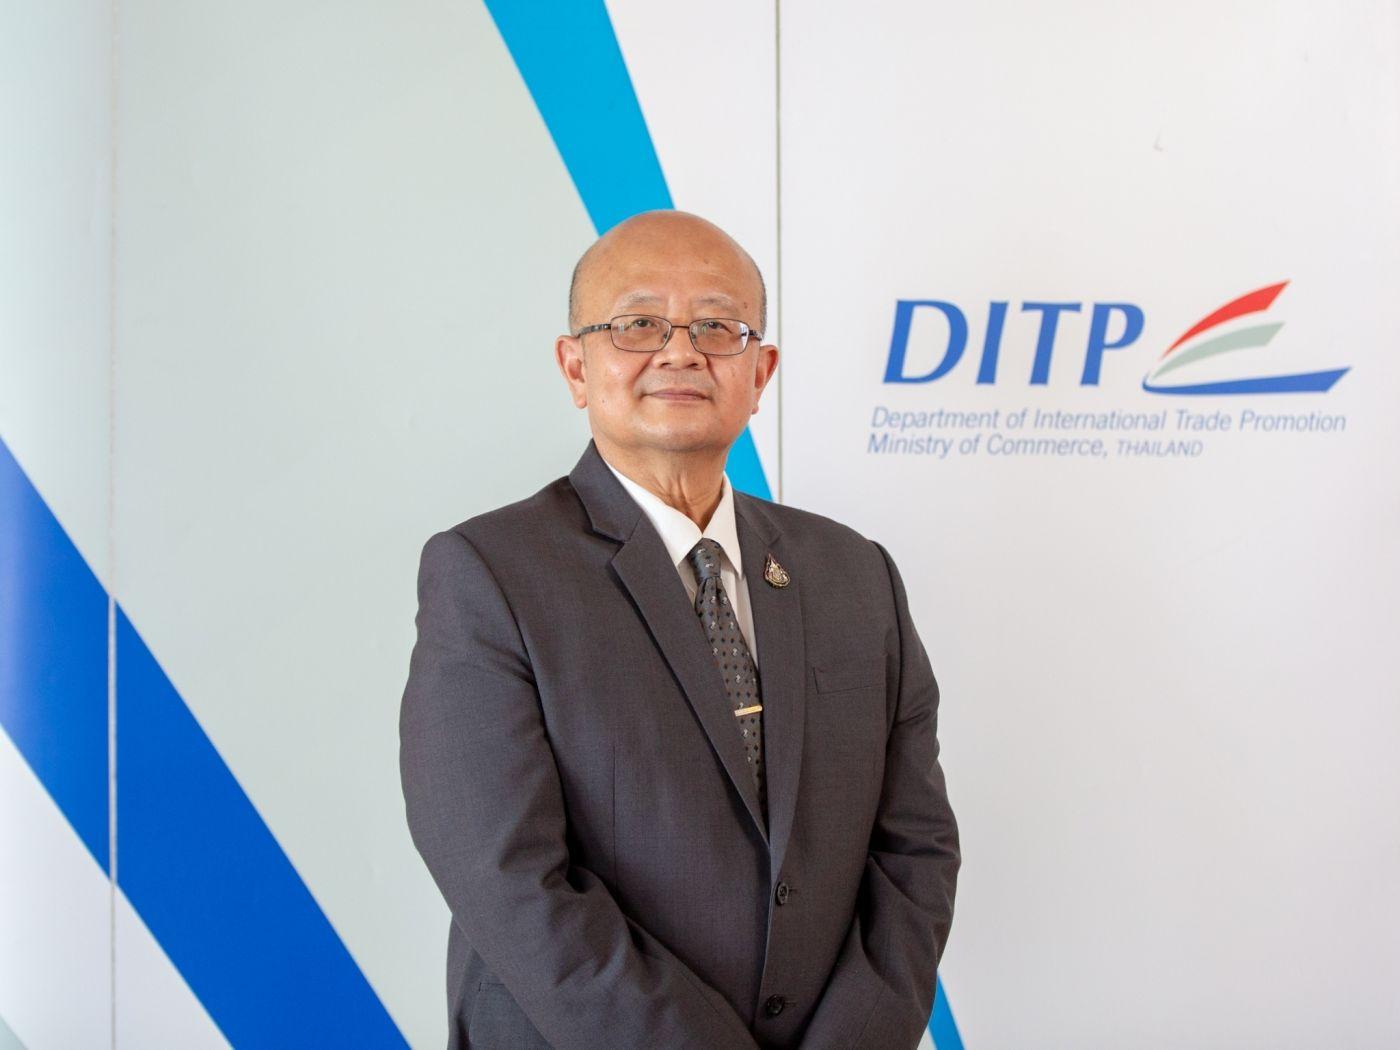 DITPแนะผู้ส่งออกศึกษาใช้ช่องทางออนไลน์ทำตลาดออสซี่ รับมือยุค NewNormal